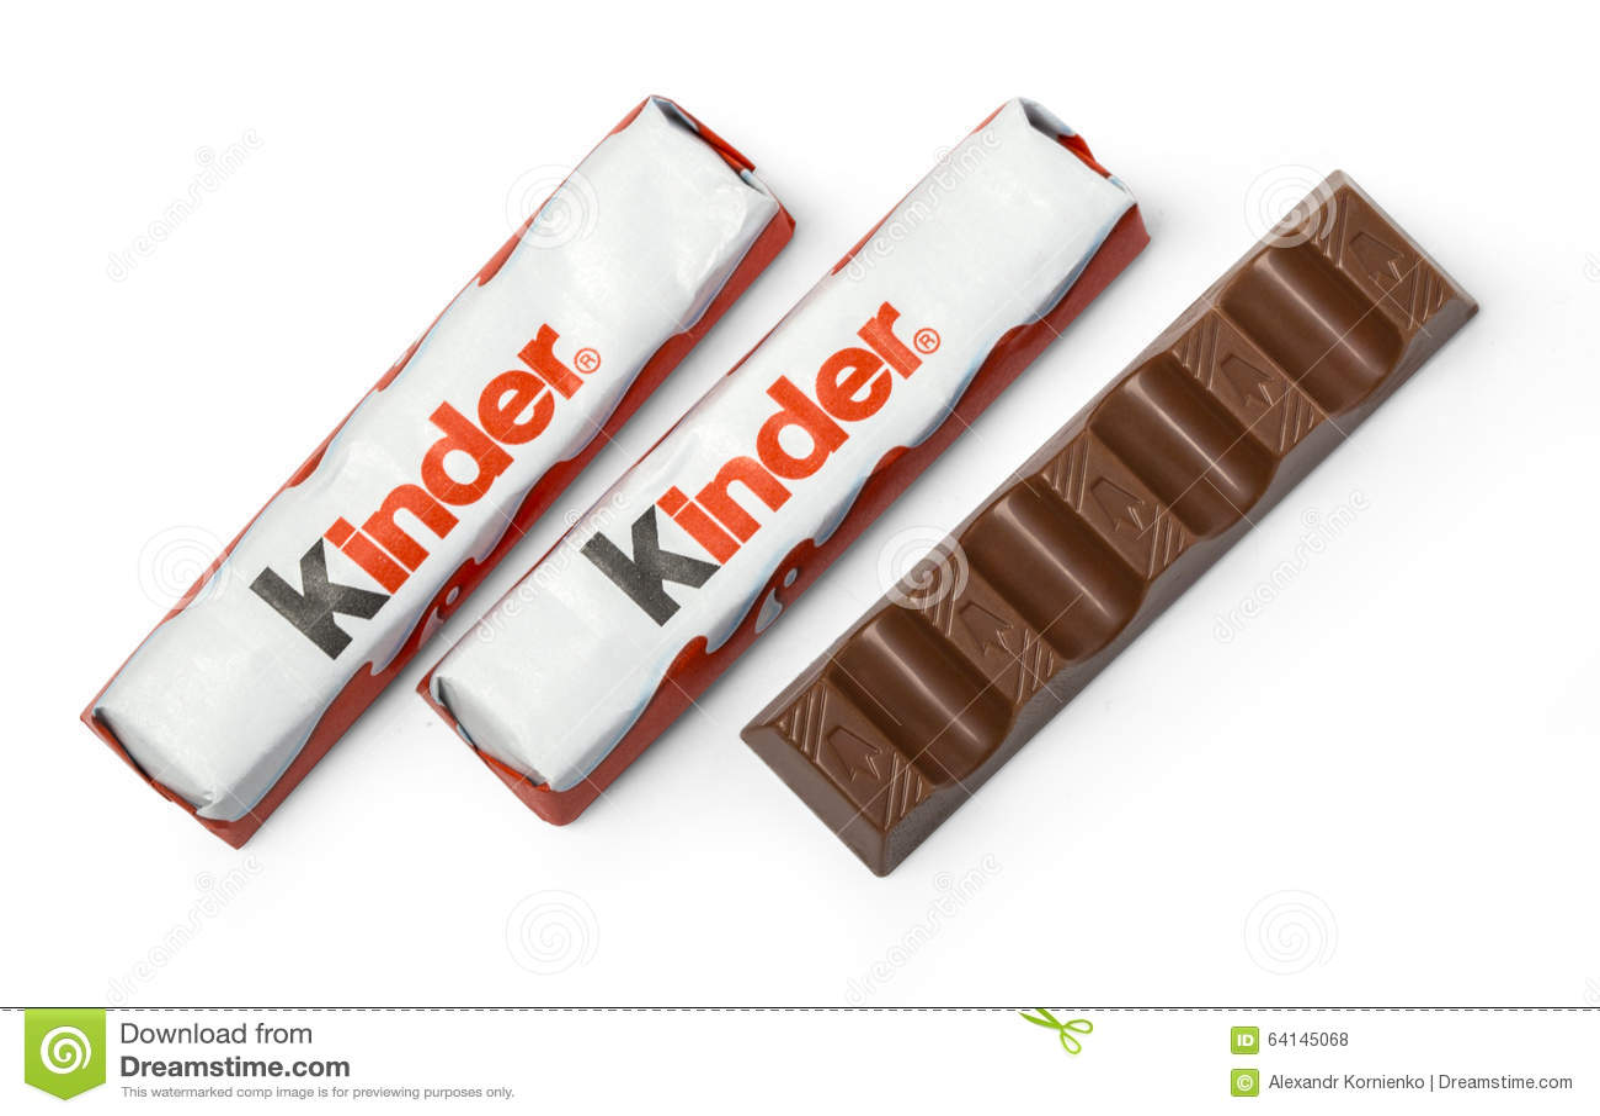 Kinder Chocolate Bars Editorial Stock Photo - Image: 64145068